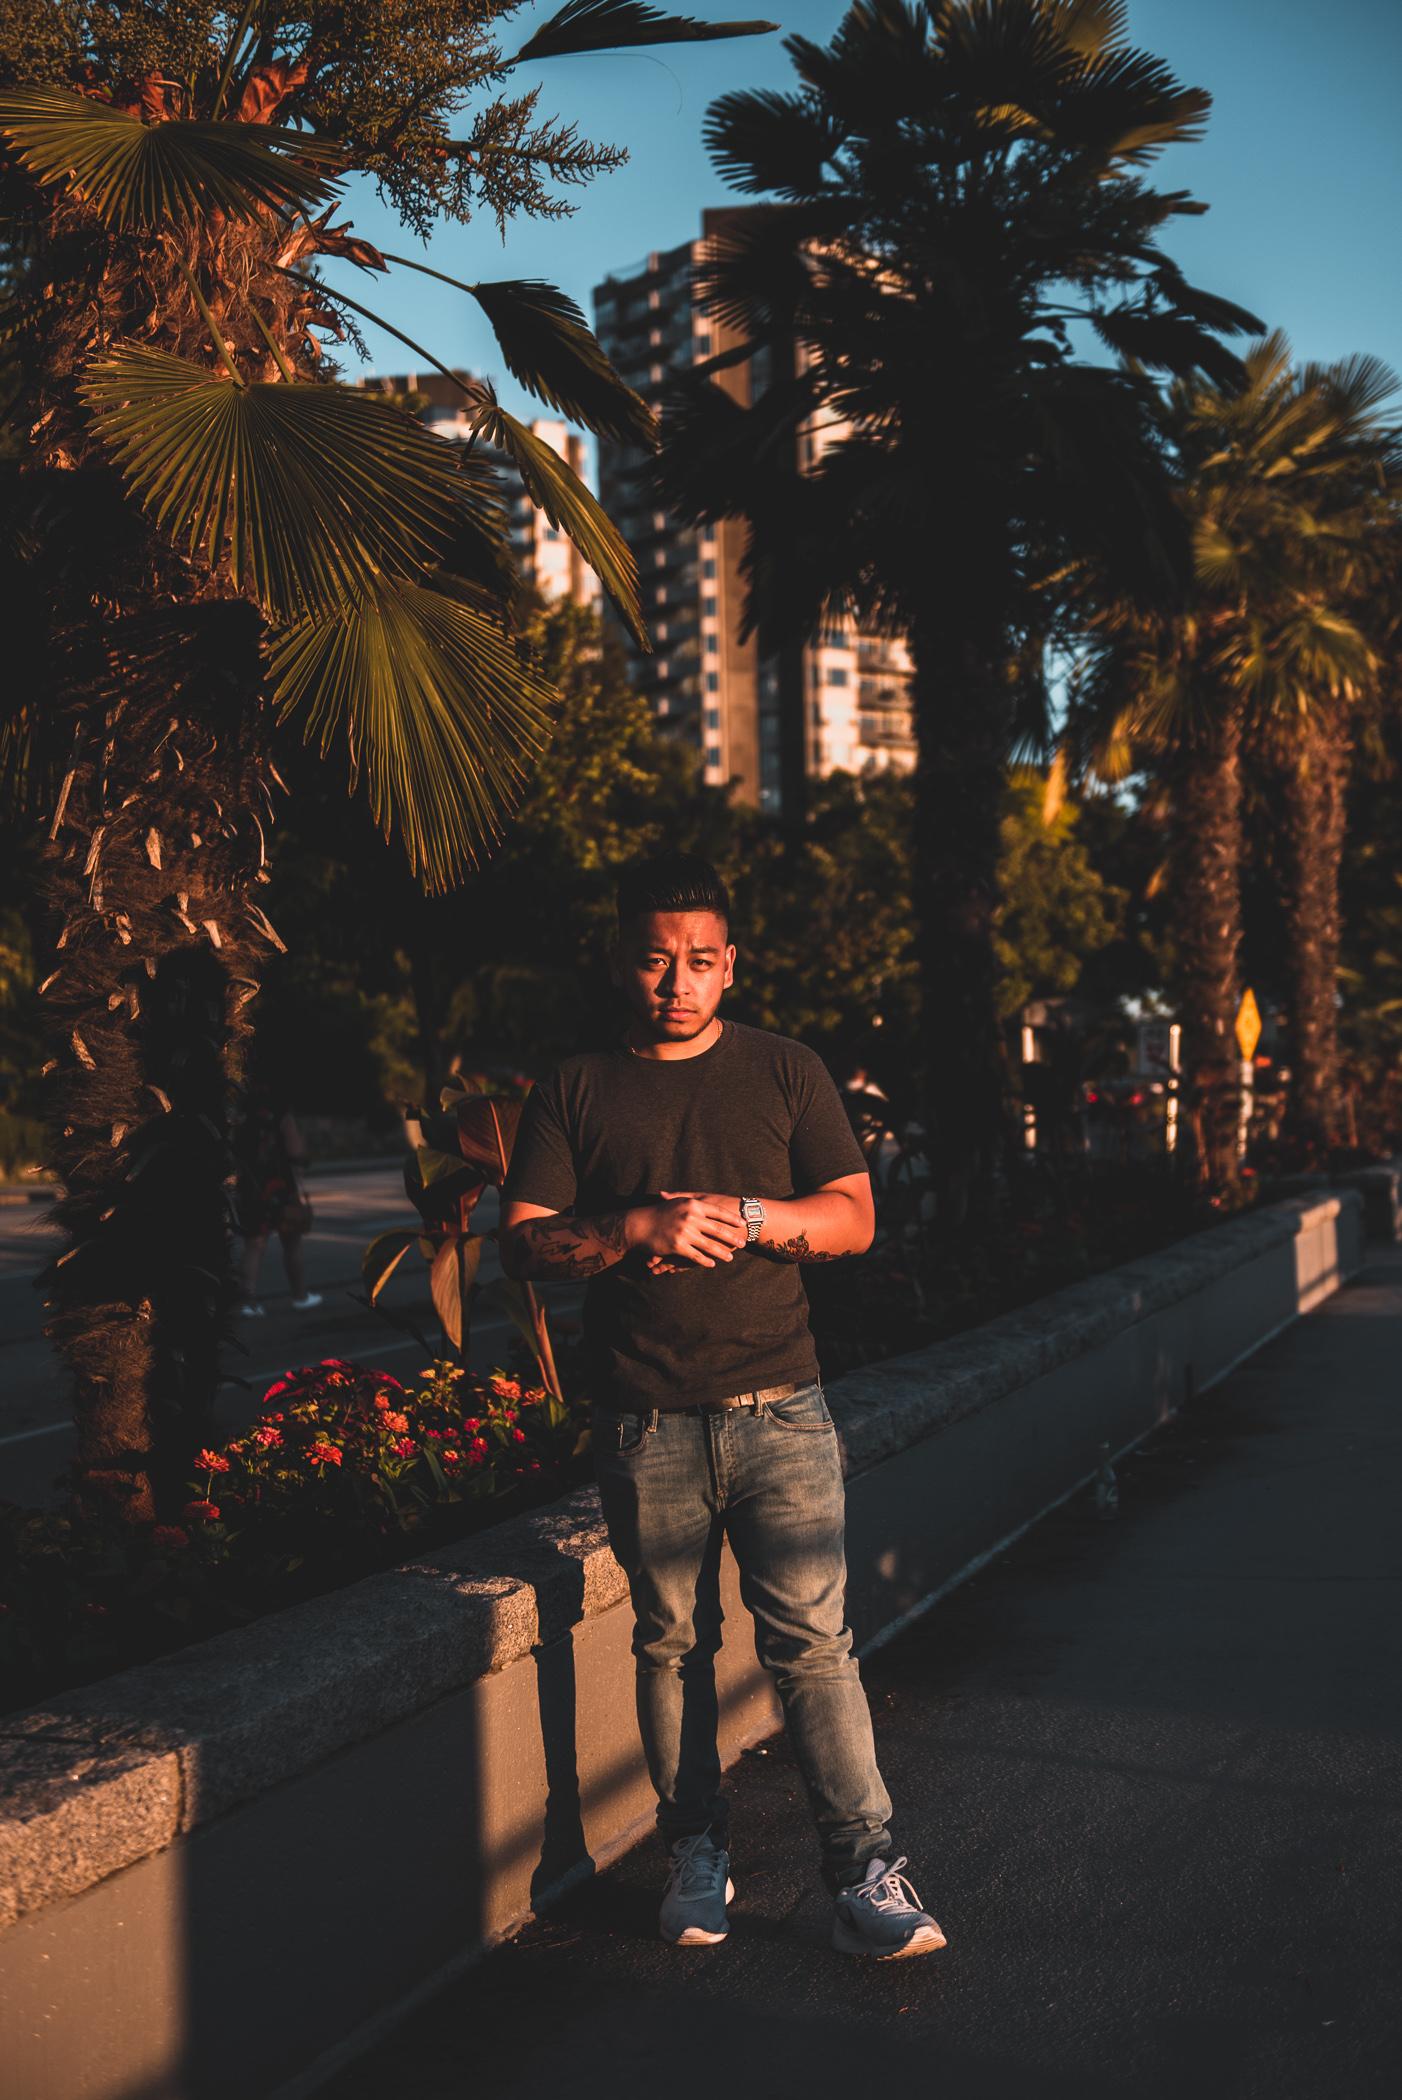 Kenny_Gourmet-Sunset_Beach-Timothy_Nguyen-20180712-17.jpg